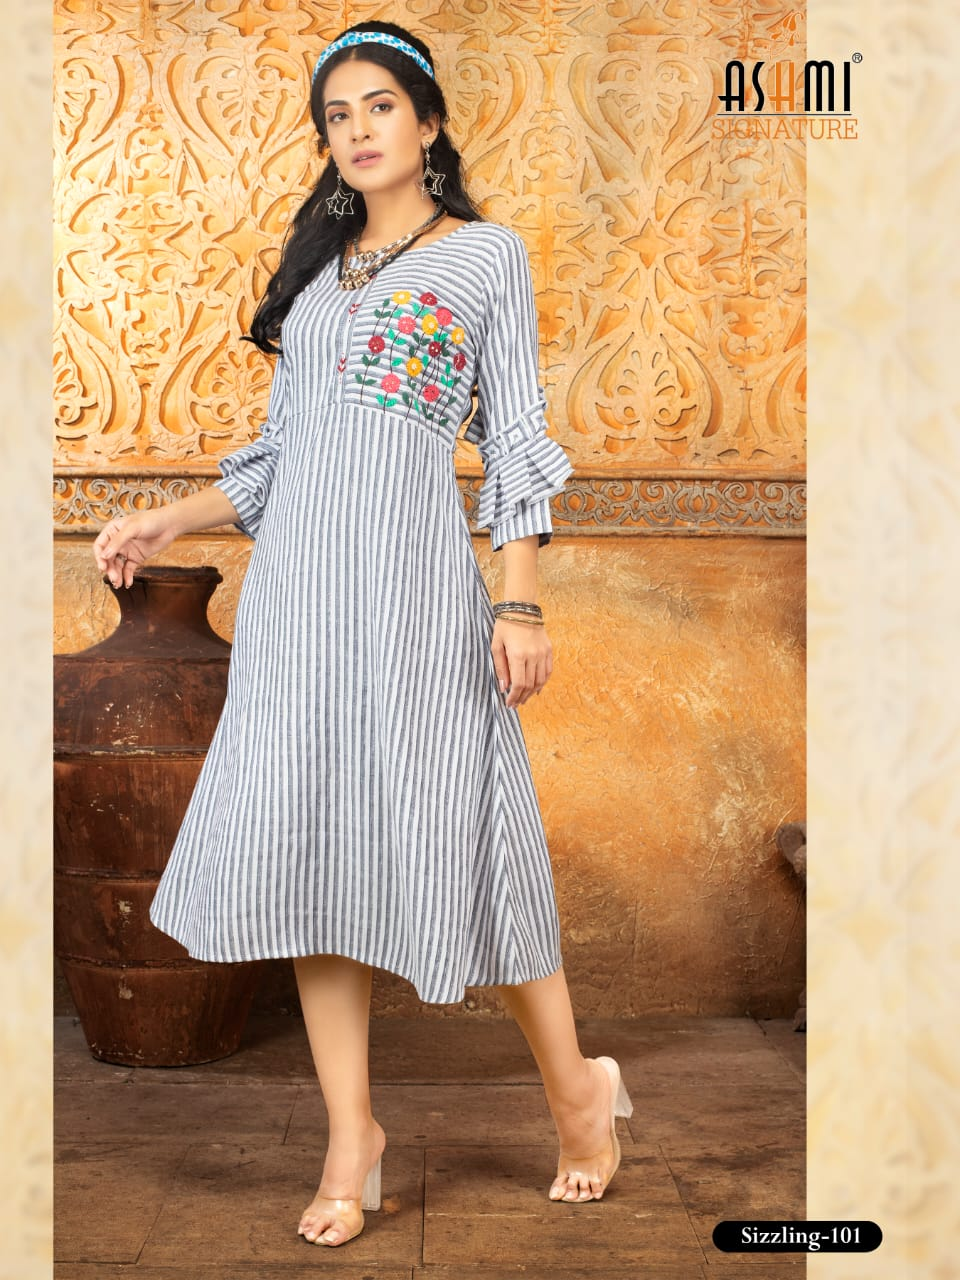 Ashmi Sizzling Knee Length Kurtis Catalog Lowest Price